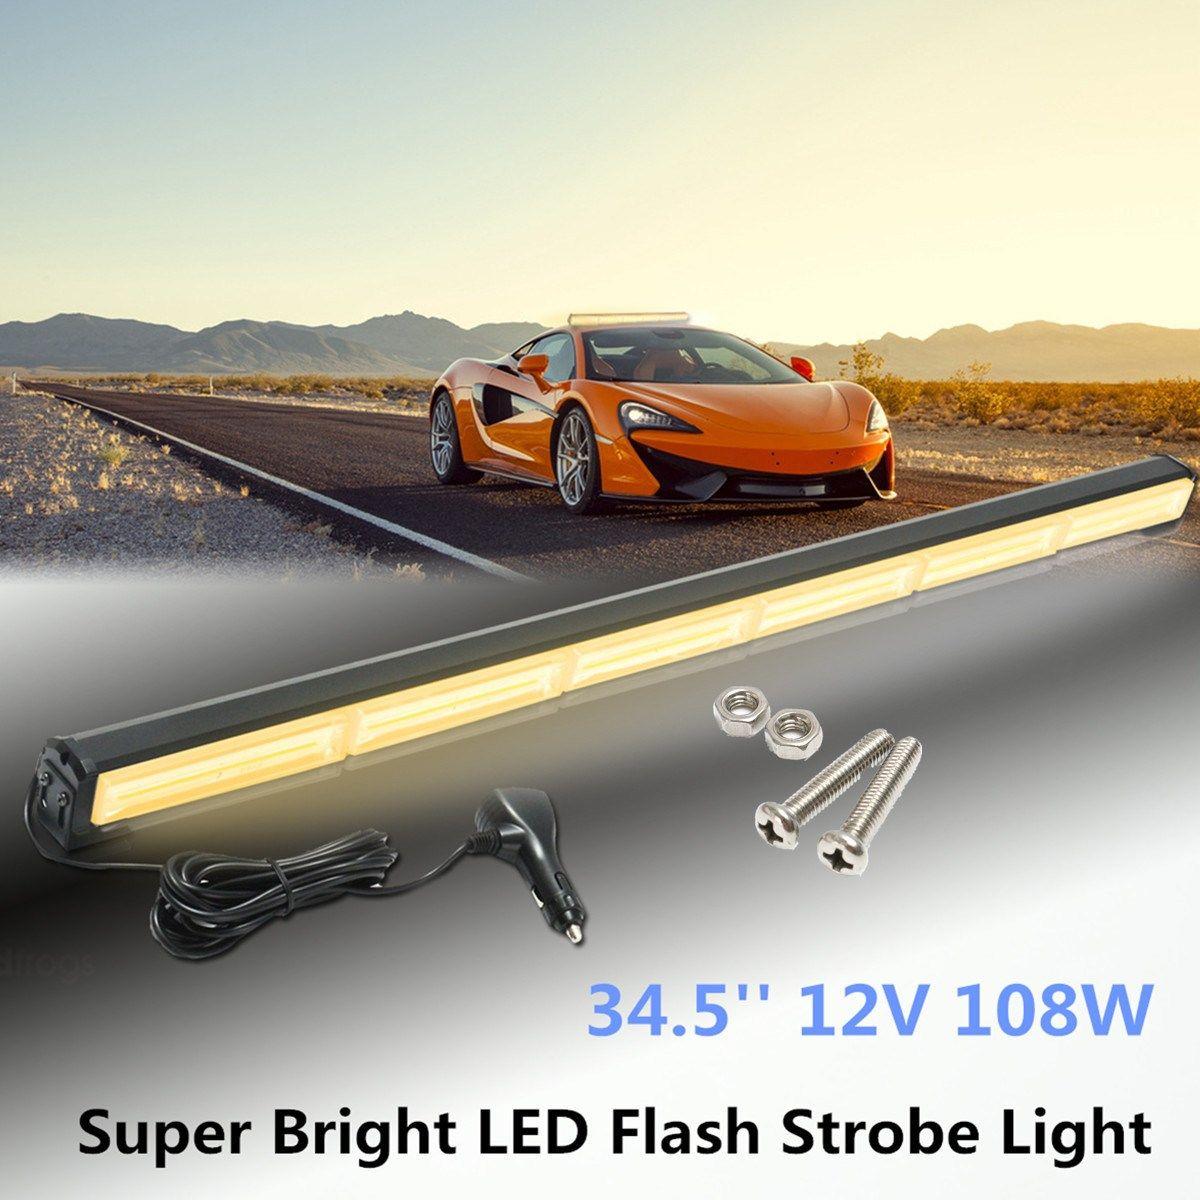 Freeshipping 6 LED 34.5Inch 12V Car External Lights Emergency Warning Lights Tow Traffic Advisor Flash Strobe Light Beacon Bar 108W